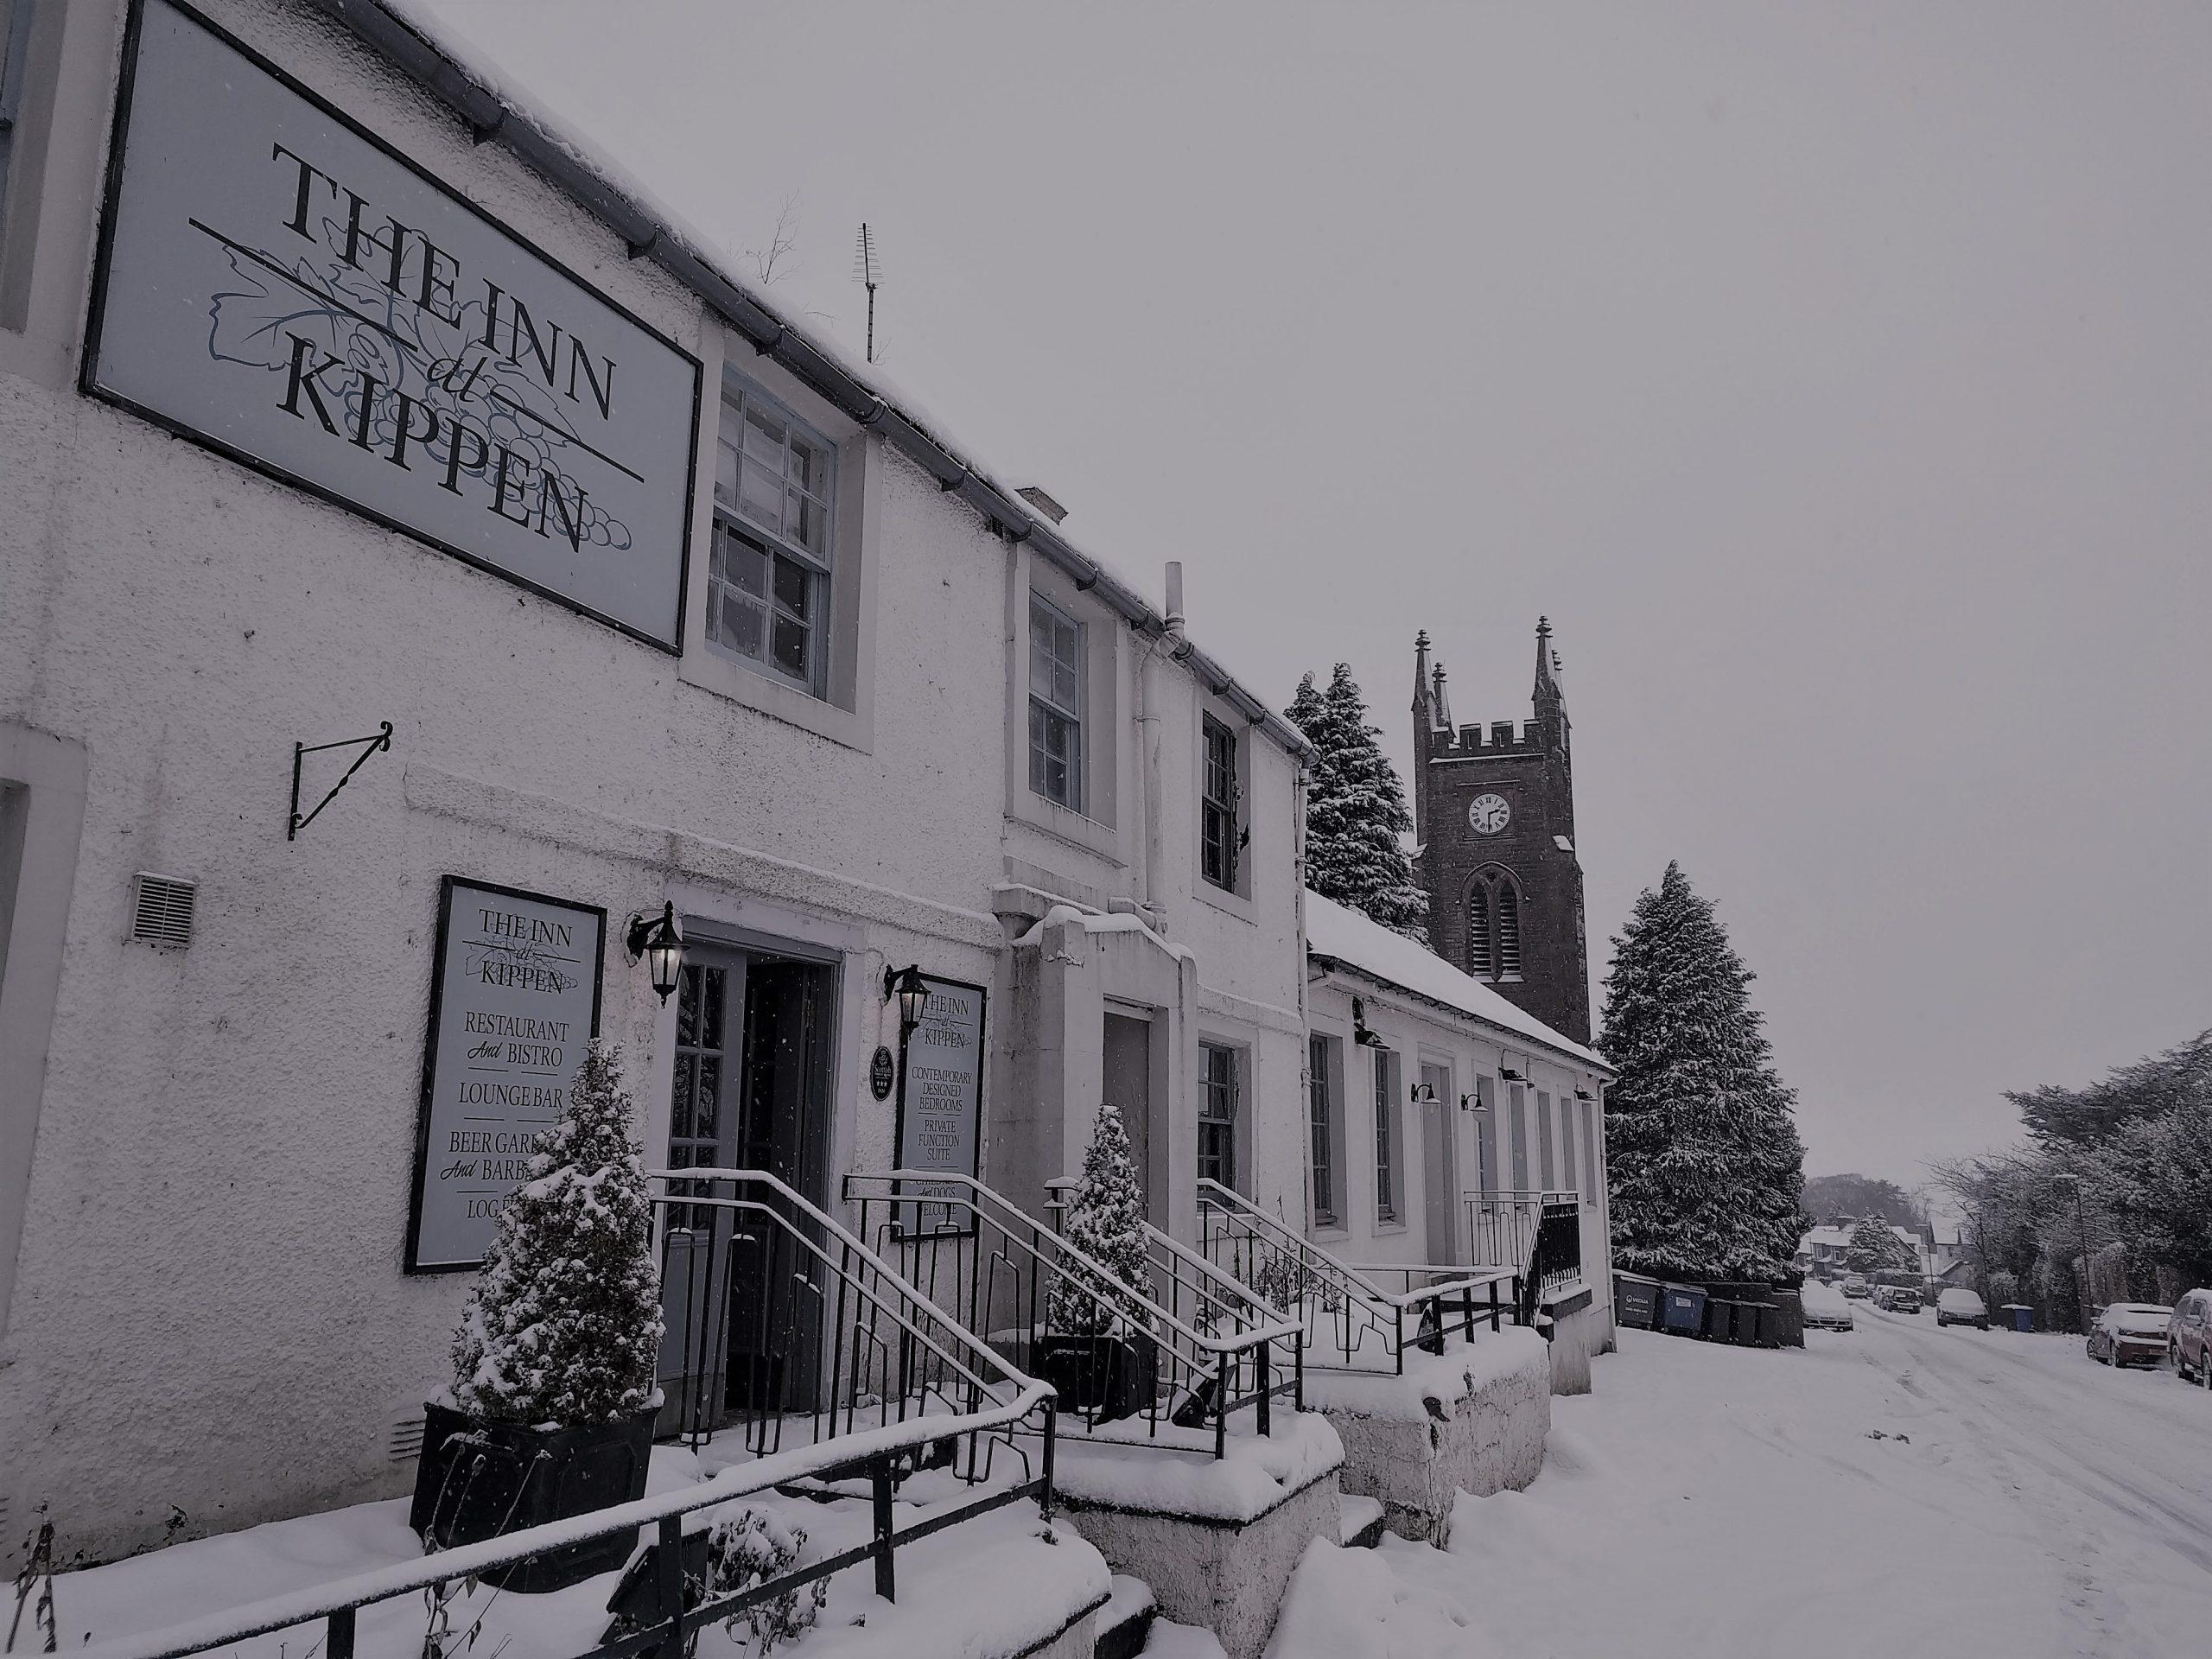 the Inn at Kippen in the snow